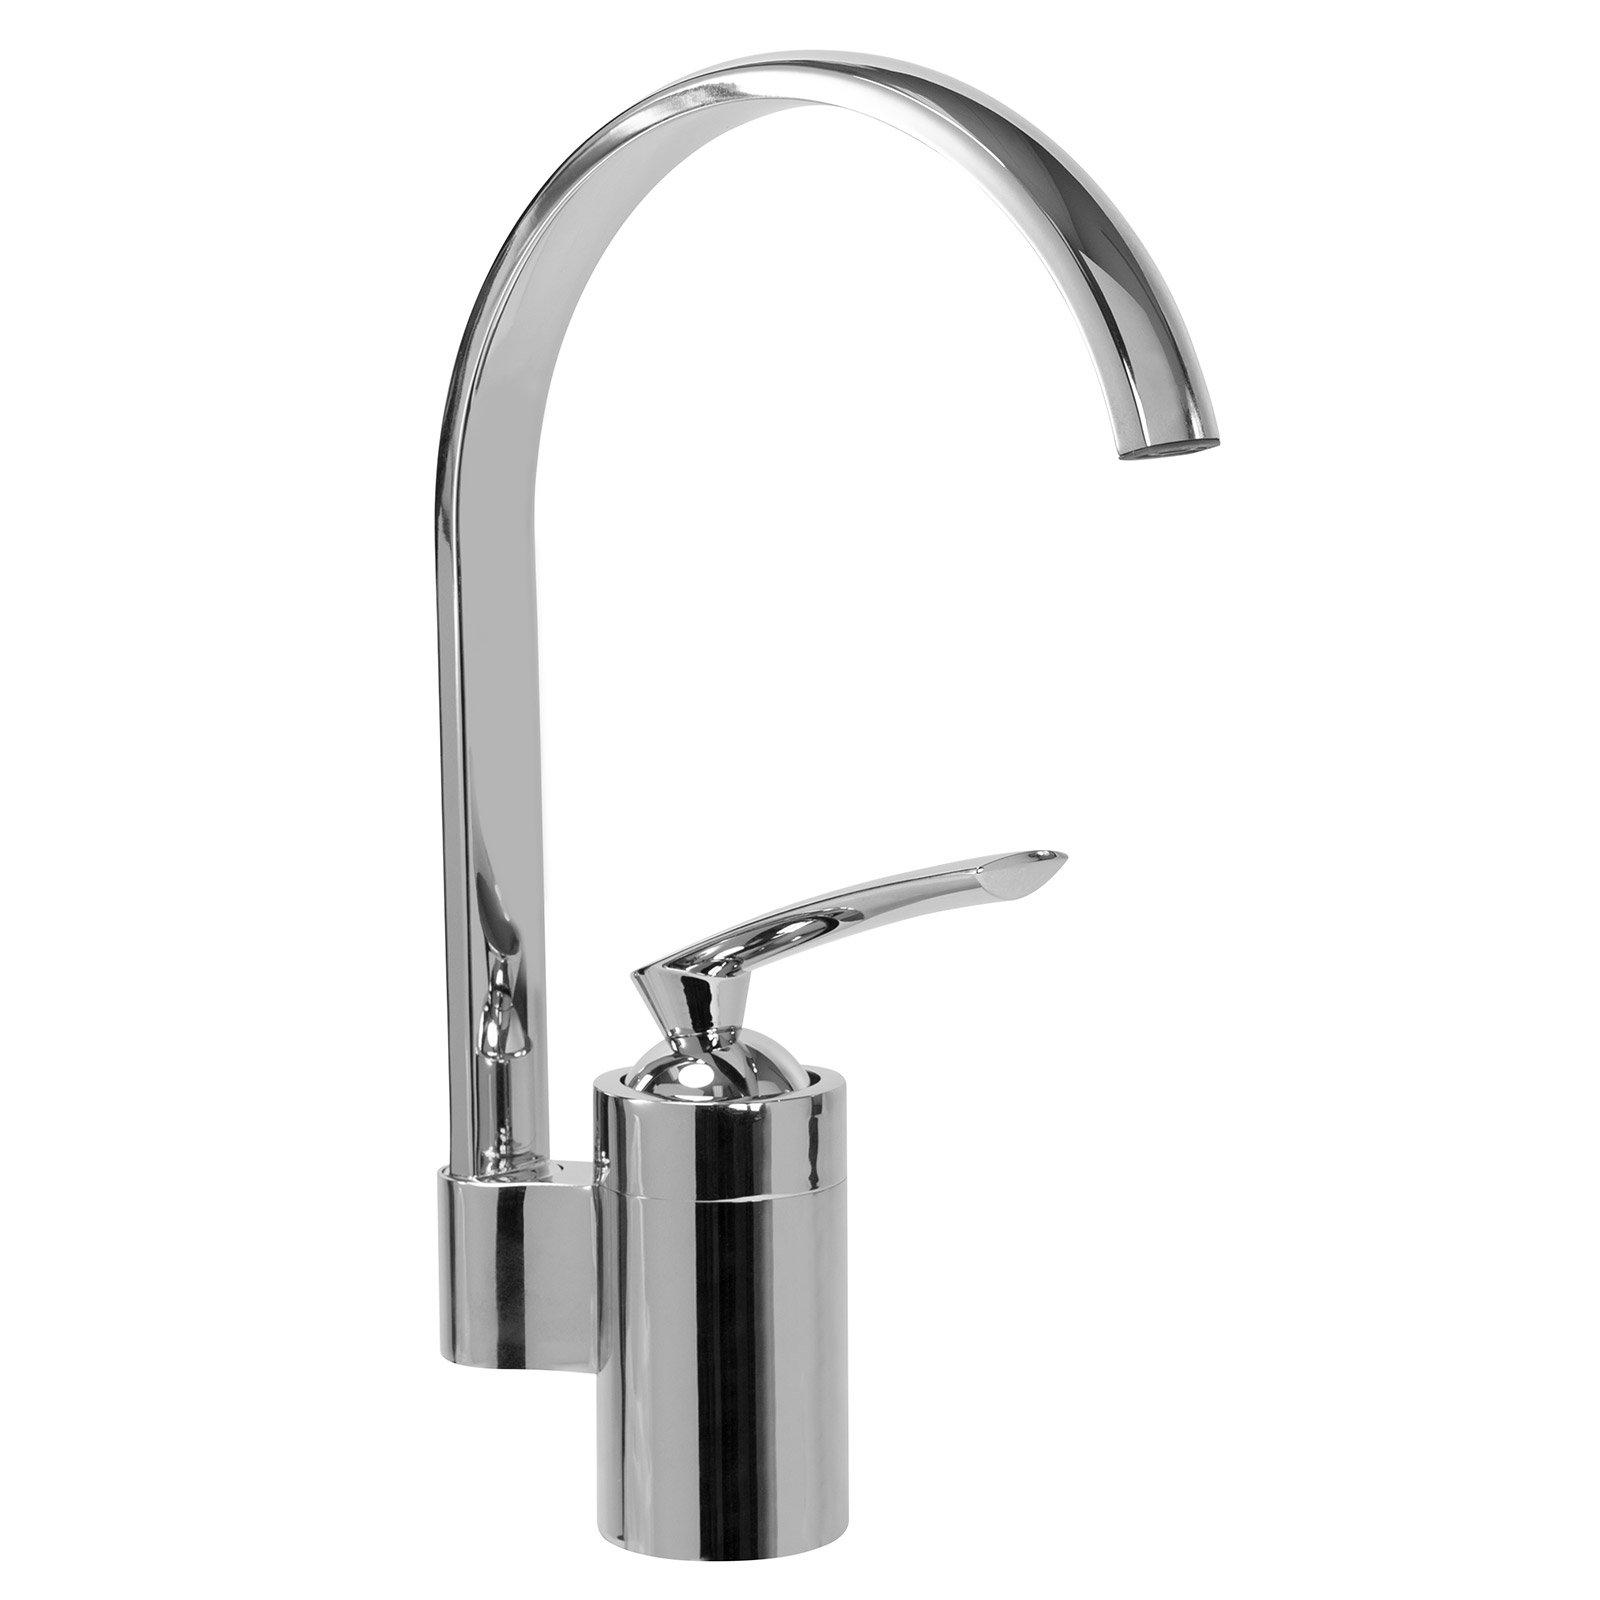 FREUER Rotatorio Collection: Modern Kitchen/Wet Bar Sink Faucet, Chrome by Freuer